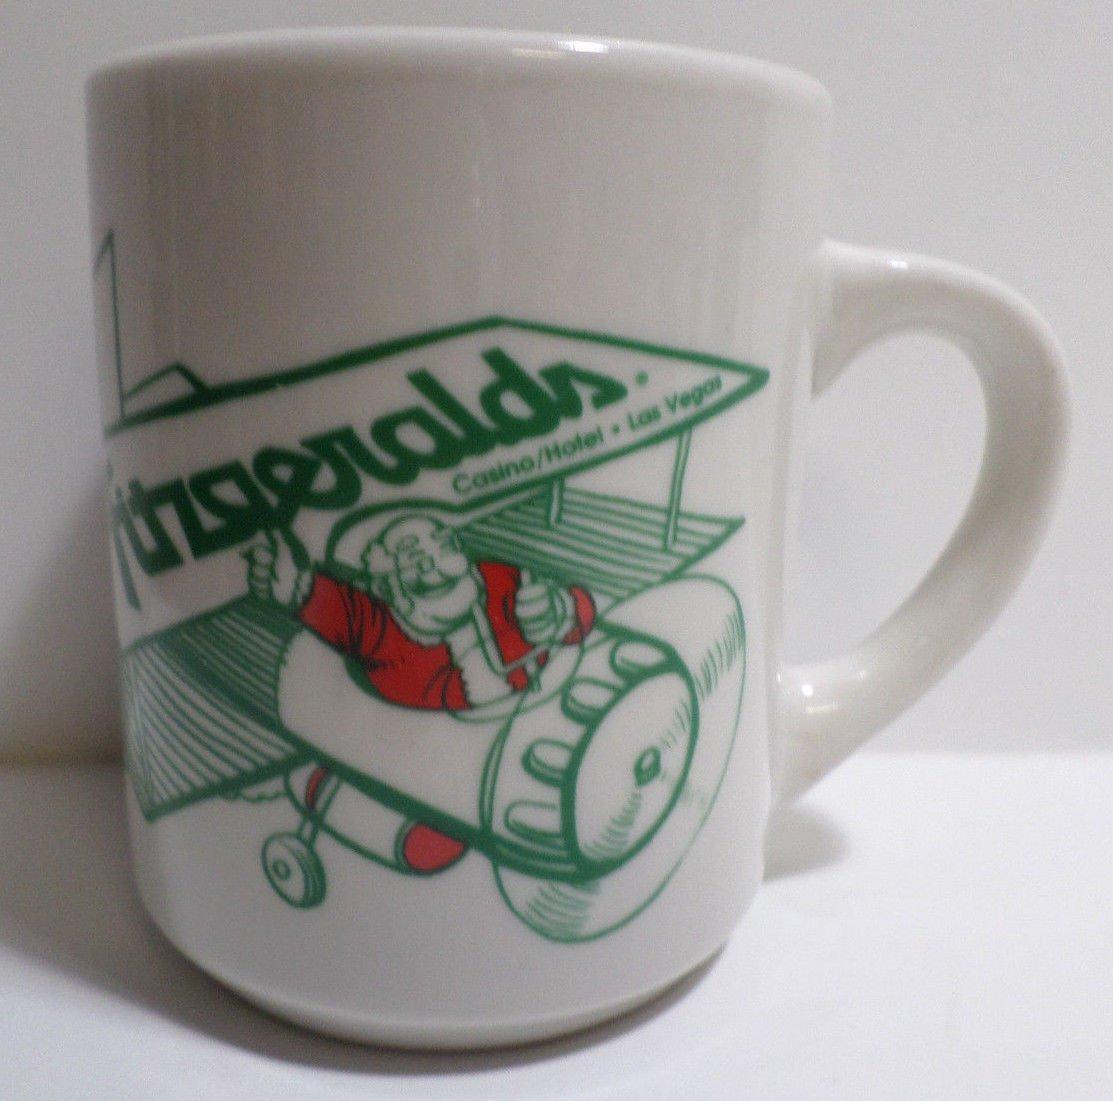 Collector Coffee Mug Fitzgerald's Casino Hotal Las Vegas Happy Holiday Christmas